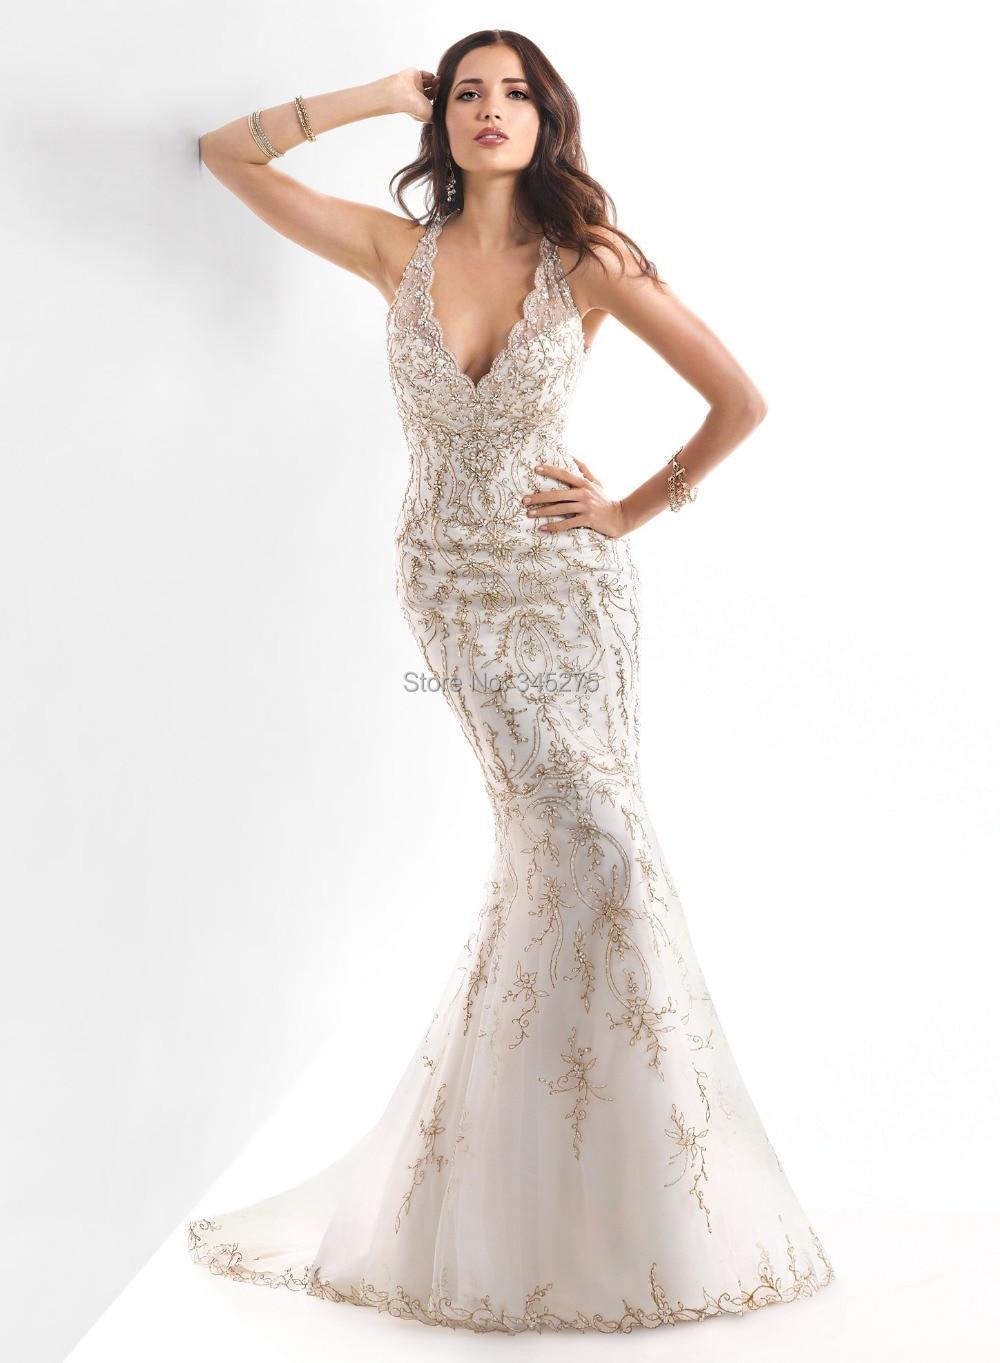 Ivory gold embroidery beading illusion v neckline wedding for Wedding dresses with gold beading